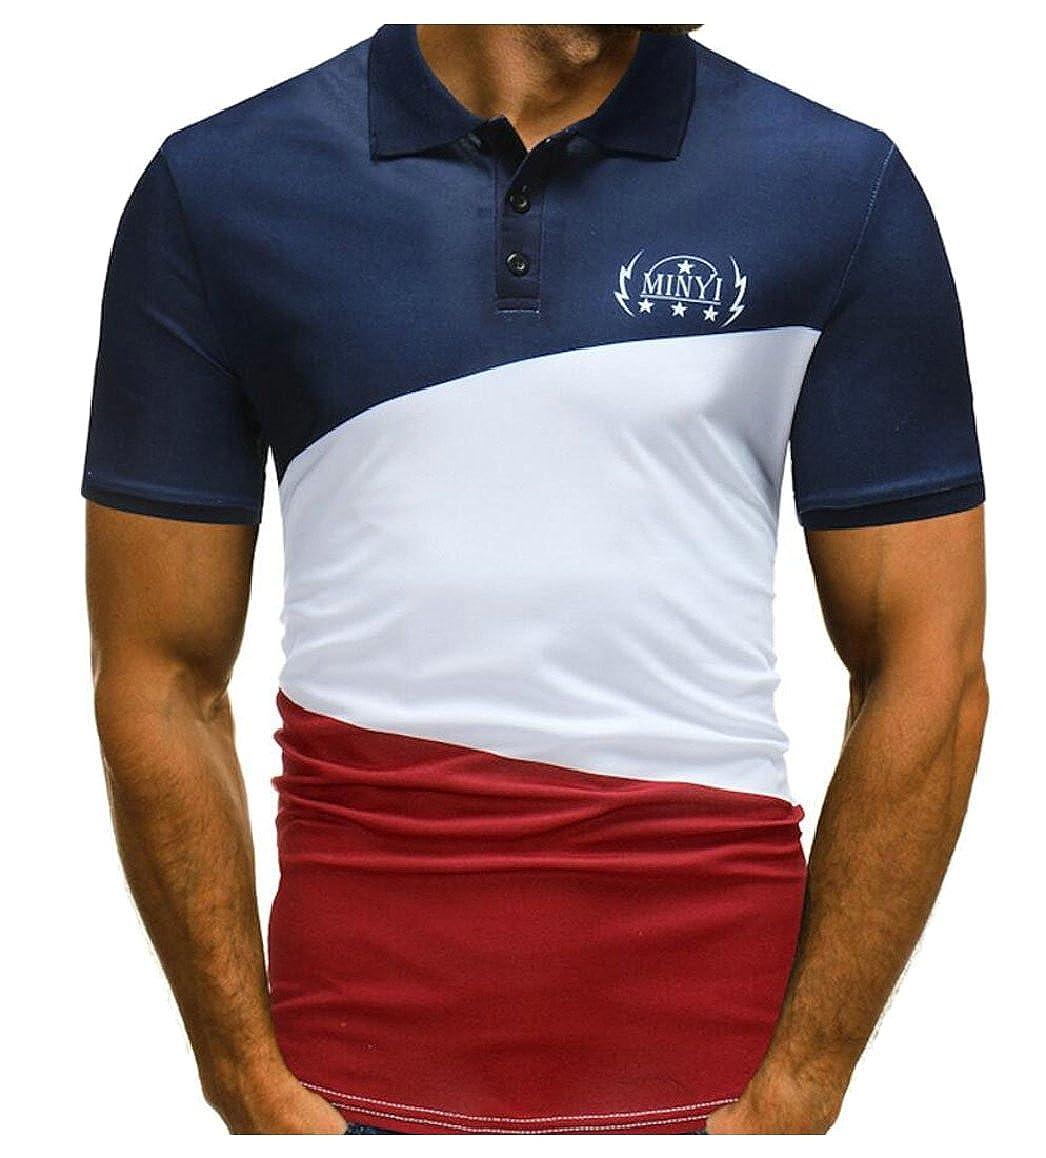 Smeiling Mens Colorblock Polo Shirt Short Sleeve Summer T Shirts At